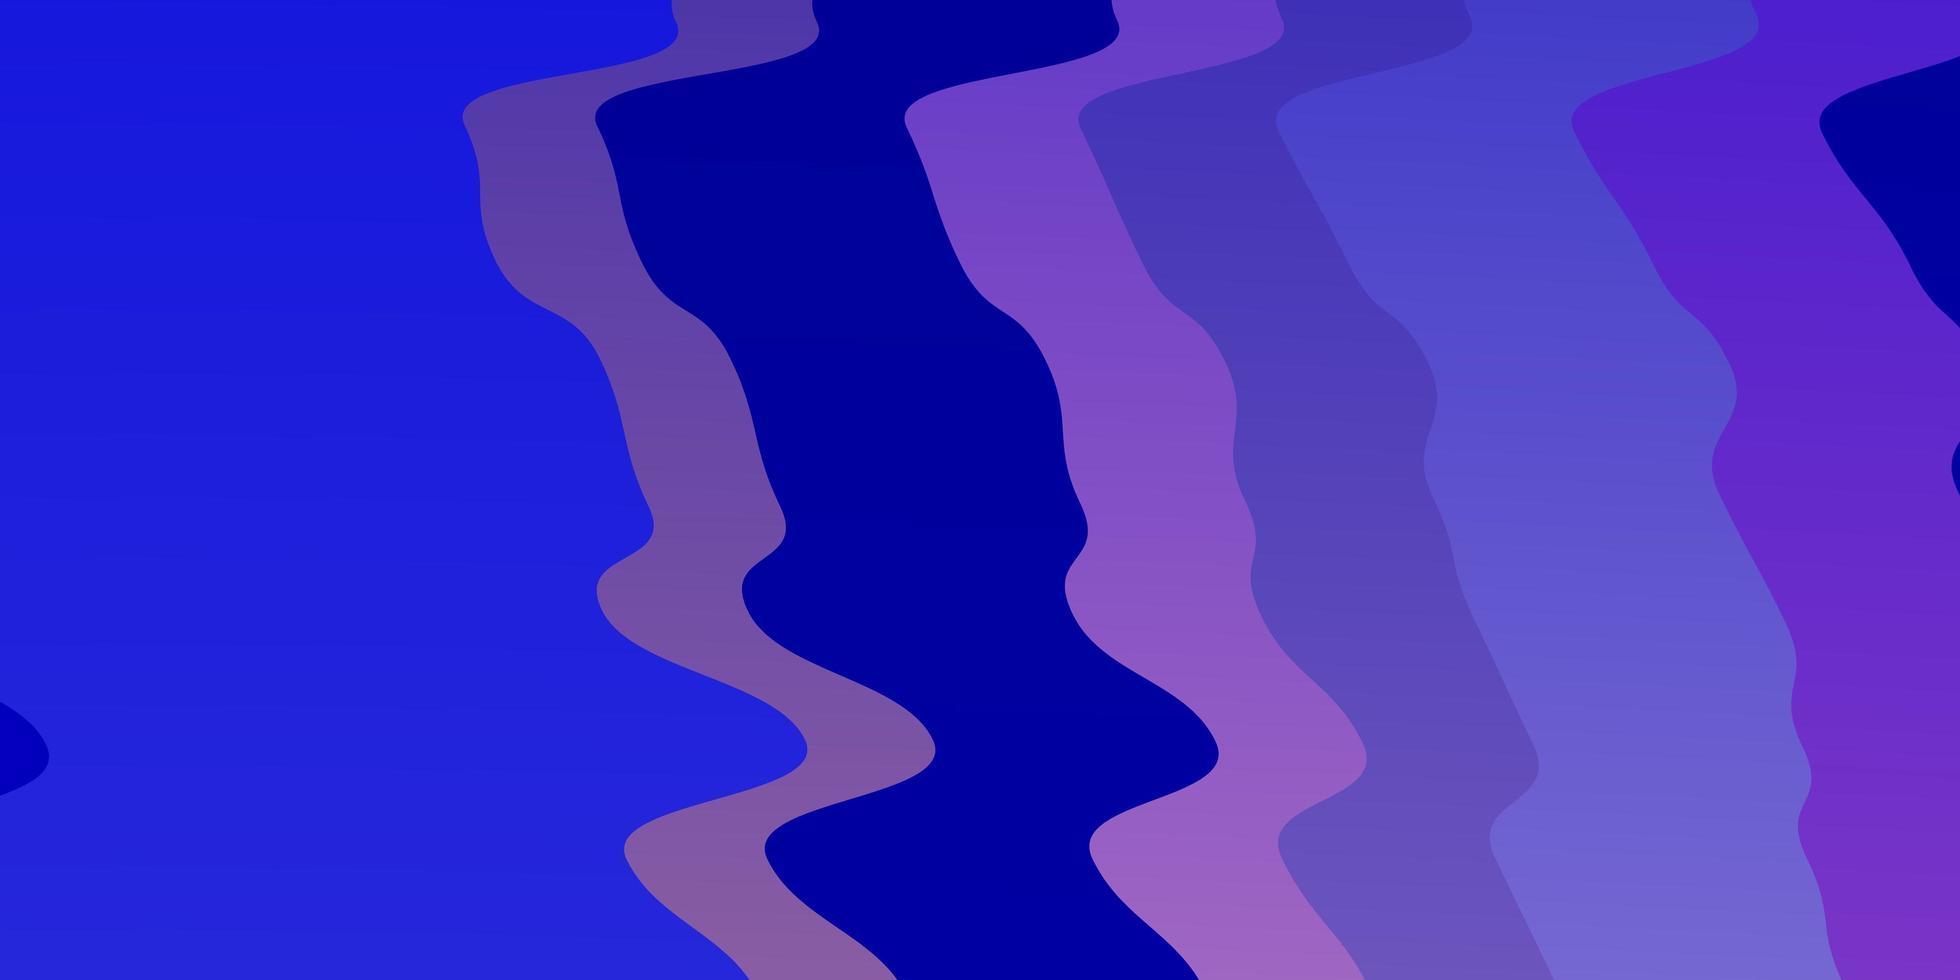 layout de vetor rosa claro, azul com curvas.